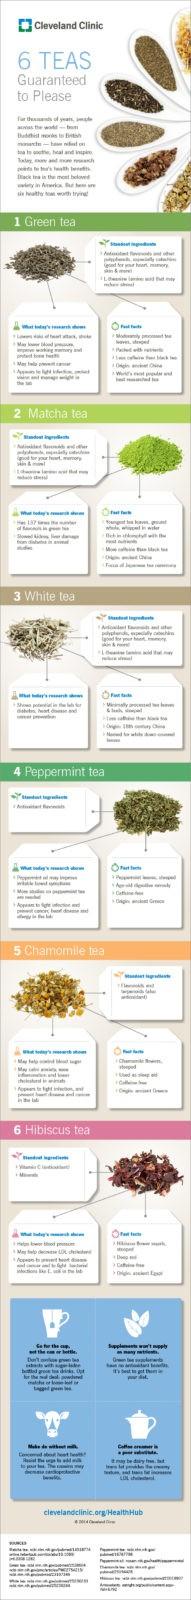 14-HHB-2009-Tea-Infographic_FNL